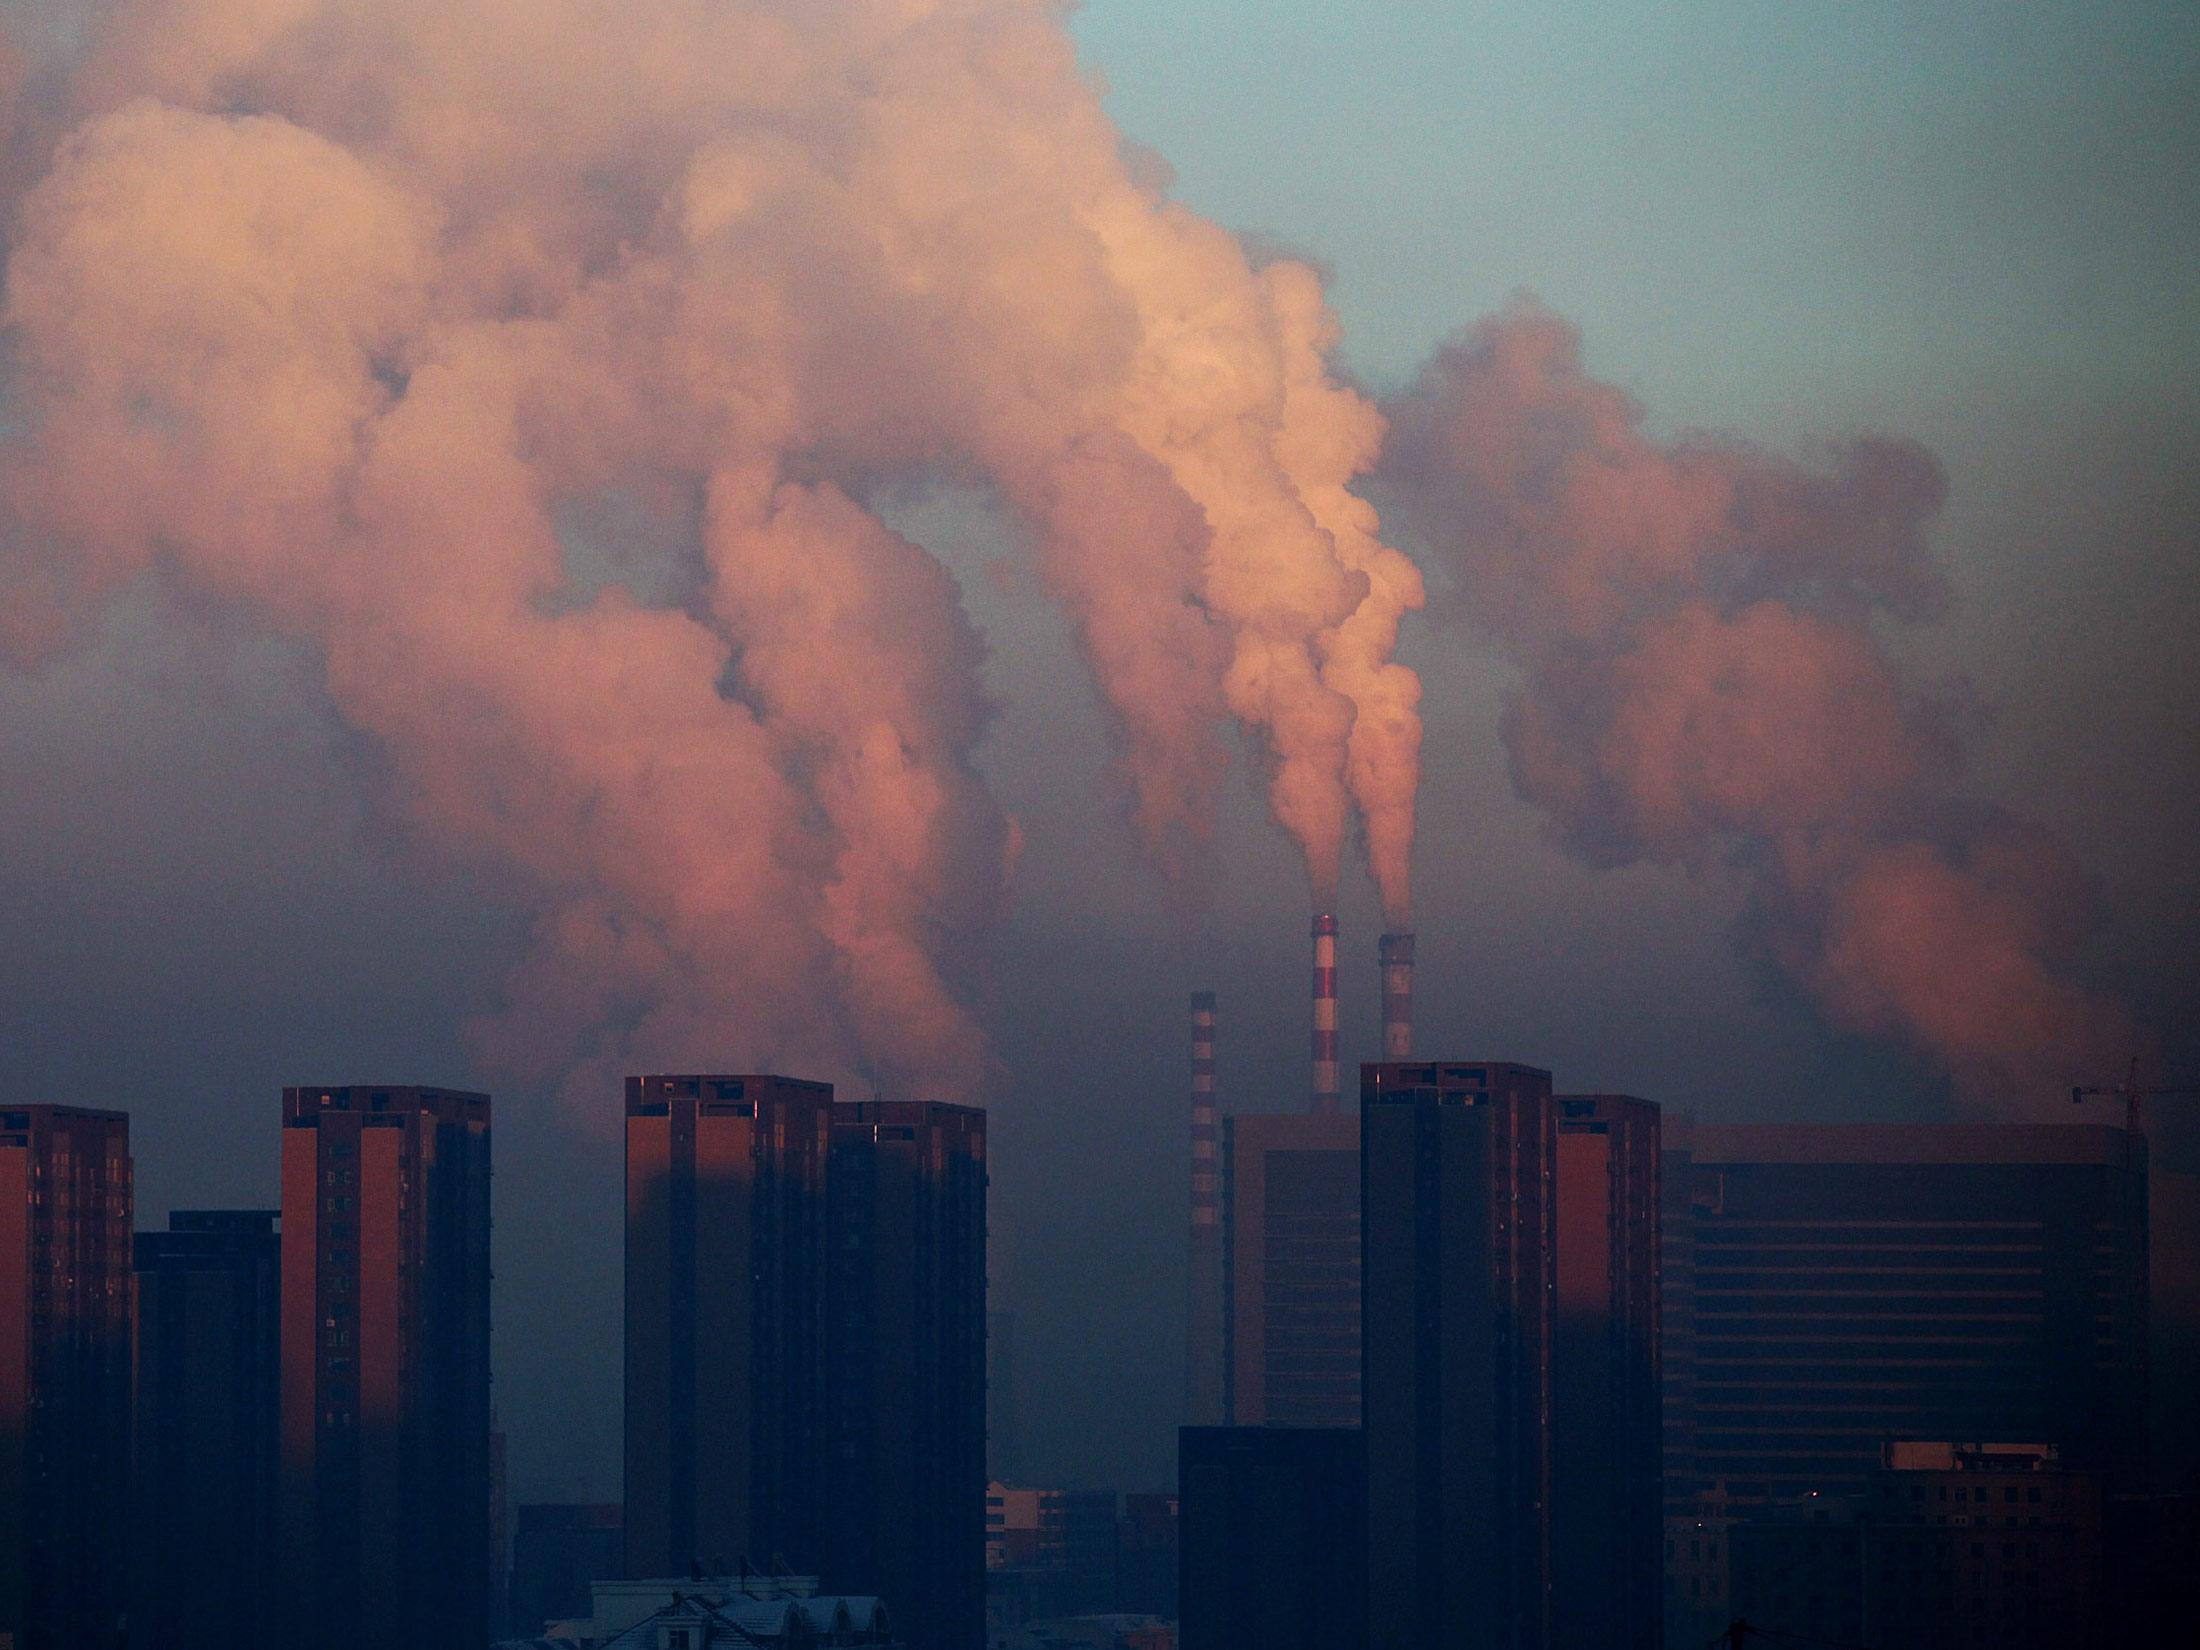 Image source plantsam com - Beijing To Shut All Major Coal Power Plants To Cut Pollution Bloomberg